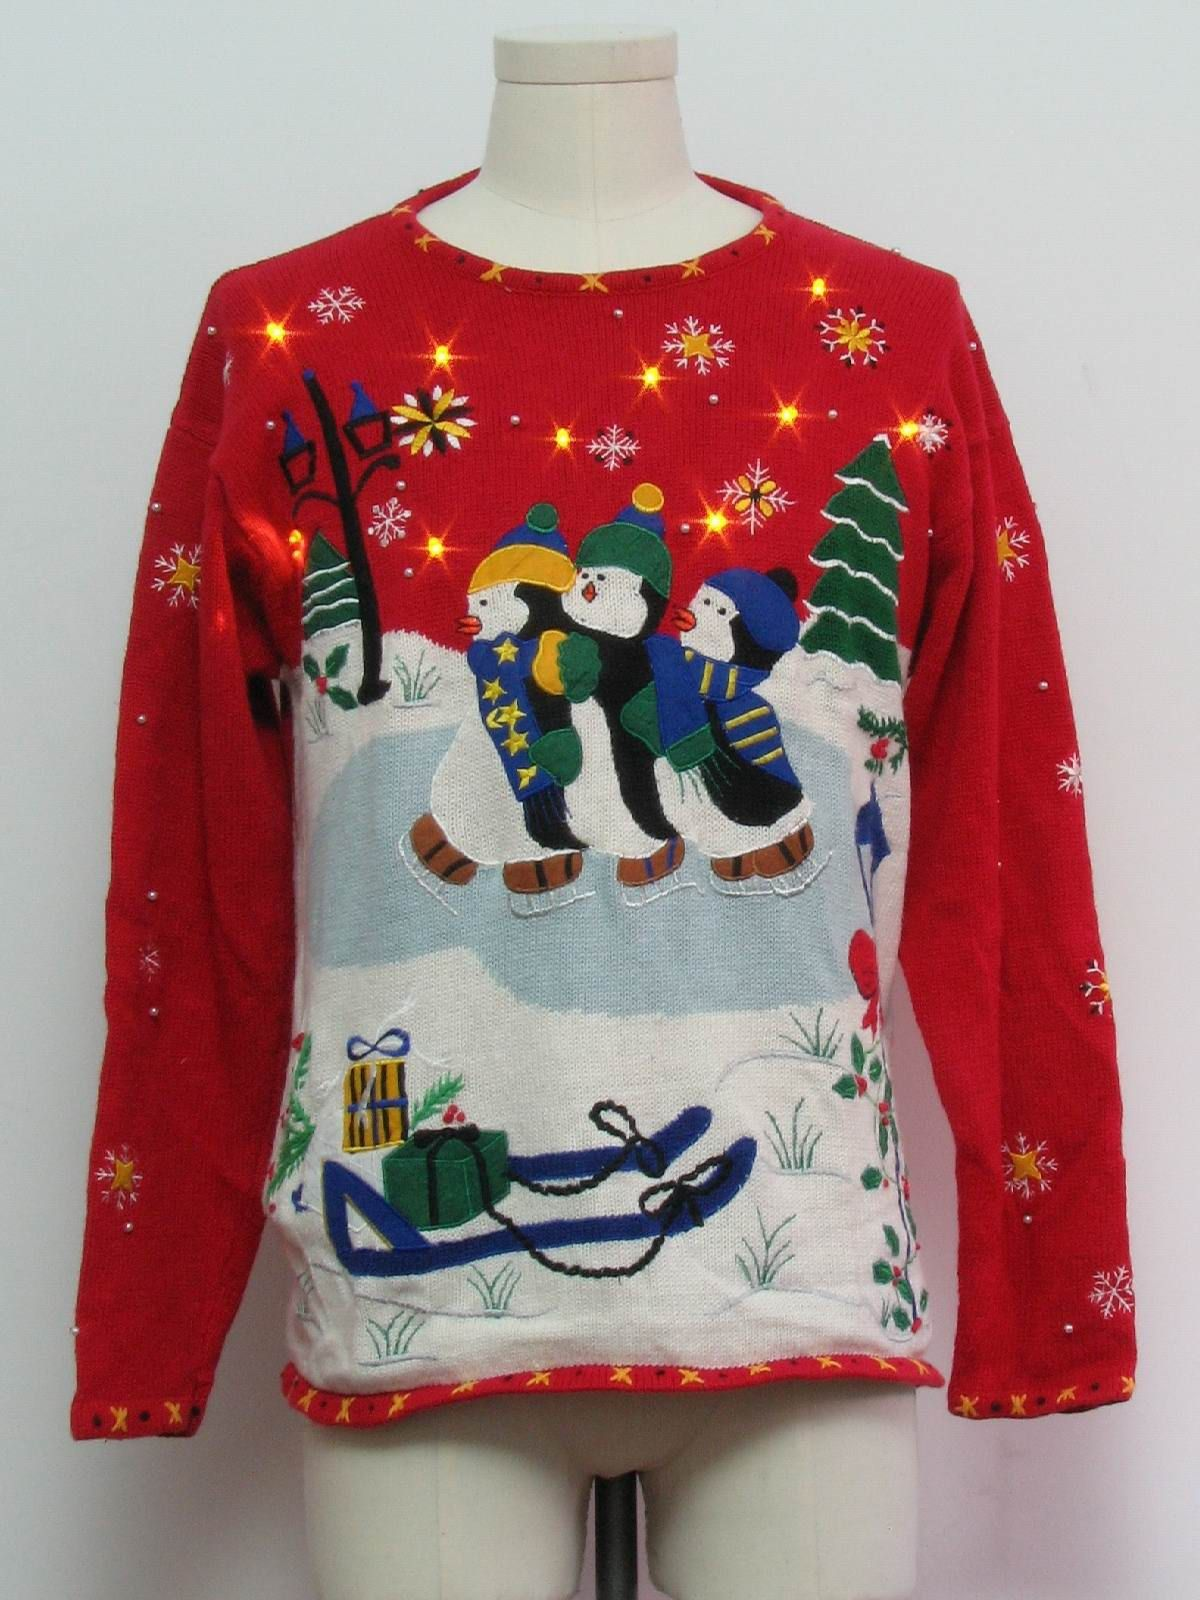 80s style -Designer Originals Studio HoHoHo- Unisex red background cotton ramie blend pullover longsleeve Ugly Christmas Extra Bright Amber ...